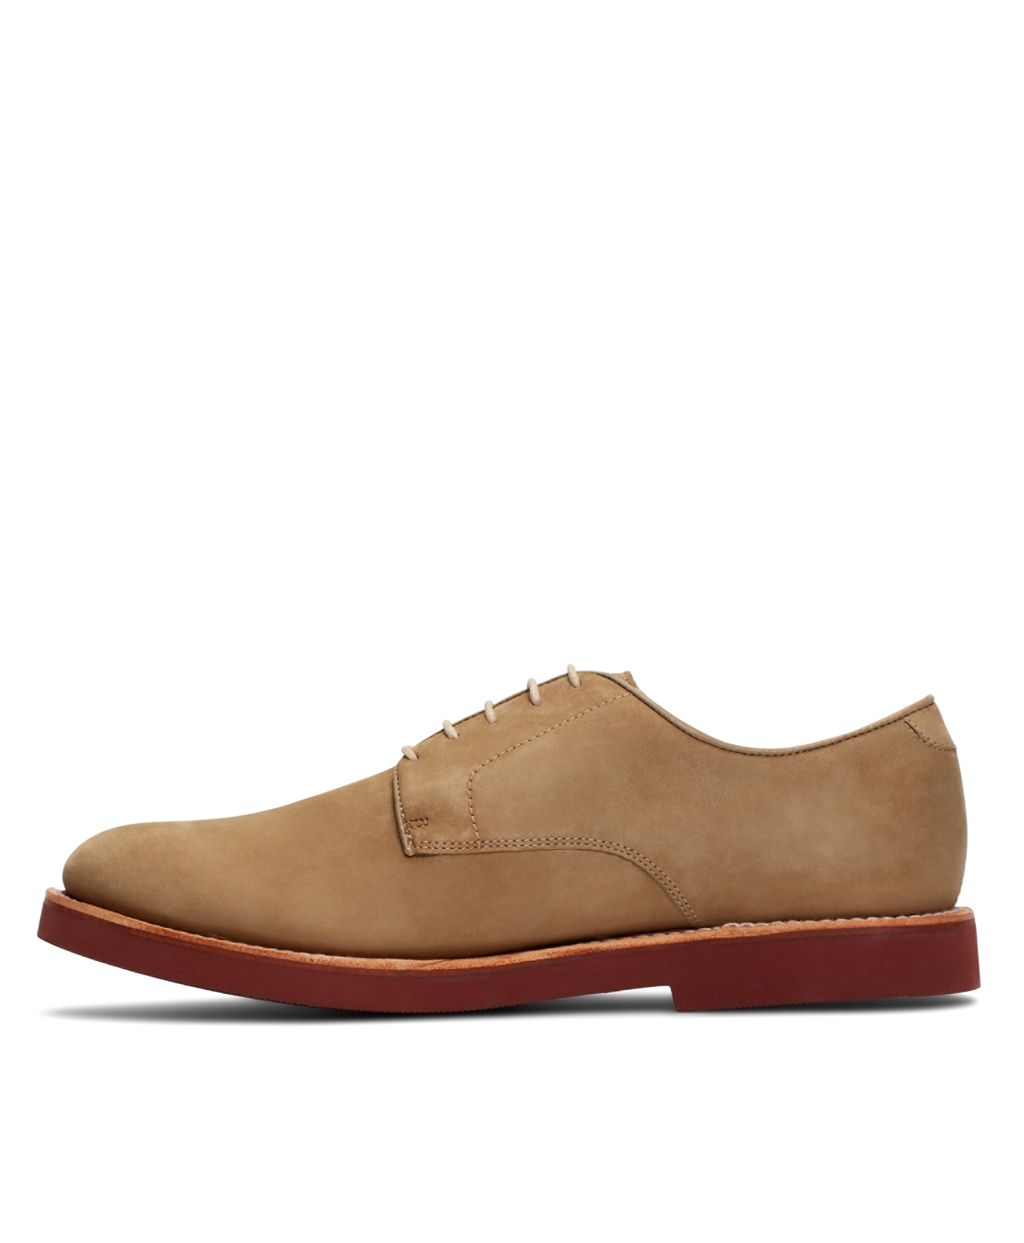 brooks brothers shoes tan nubuck